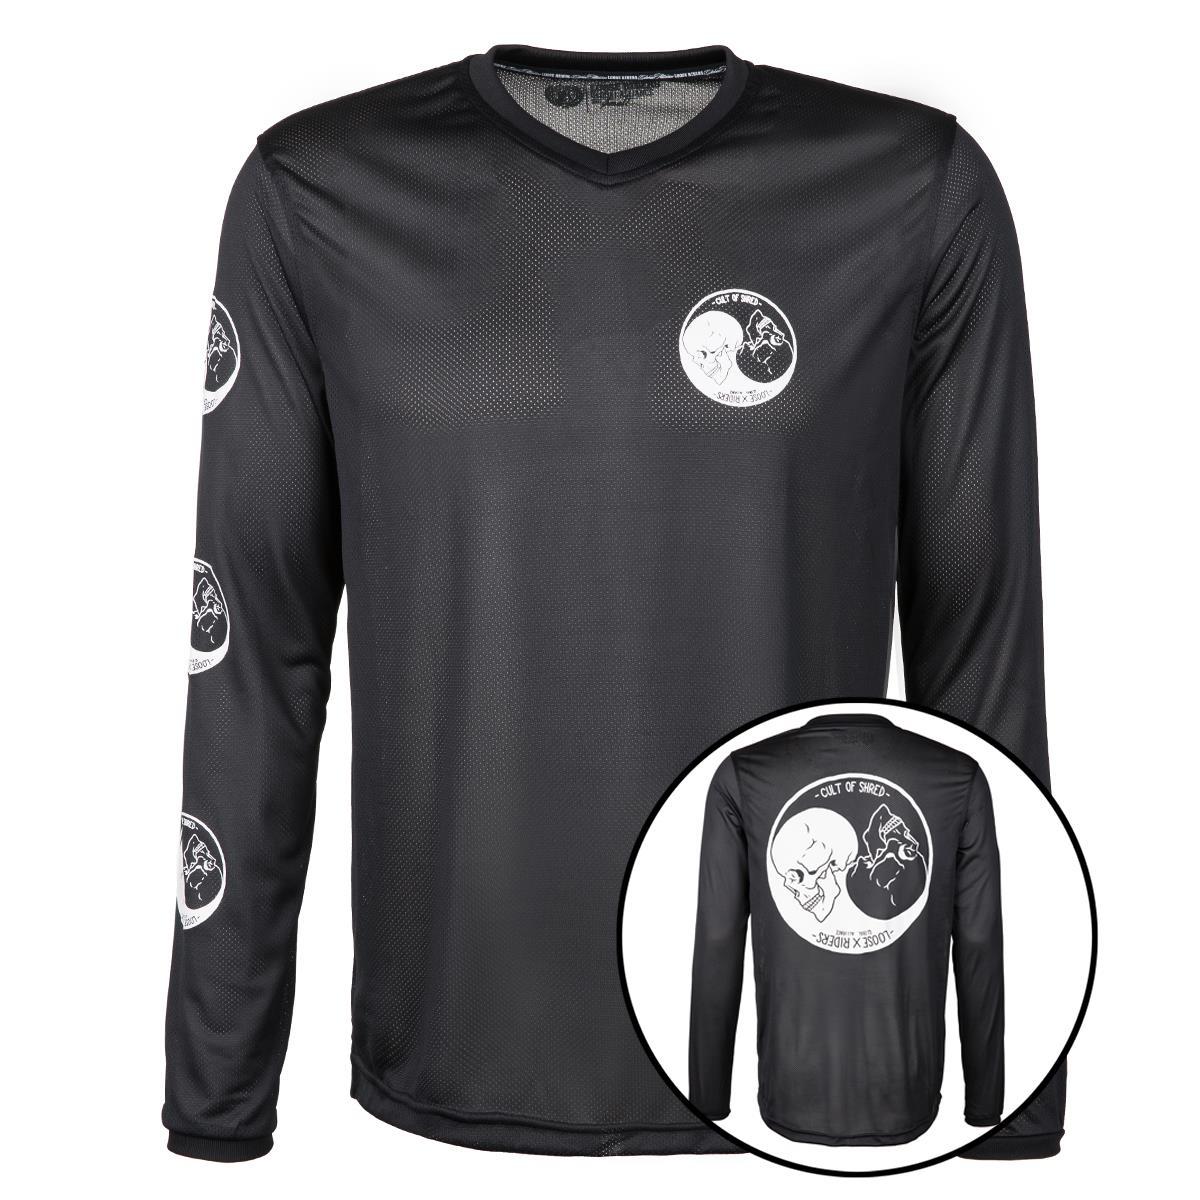 Loose Riders Bike-Jersey Black Series Yin & Yang - Schwarz/Weiß